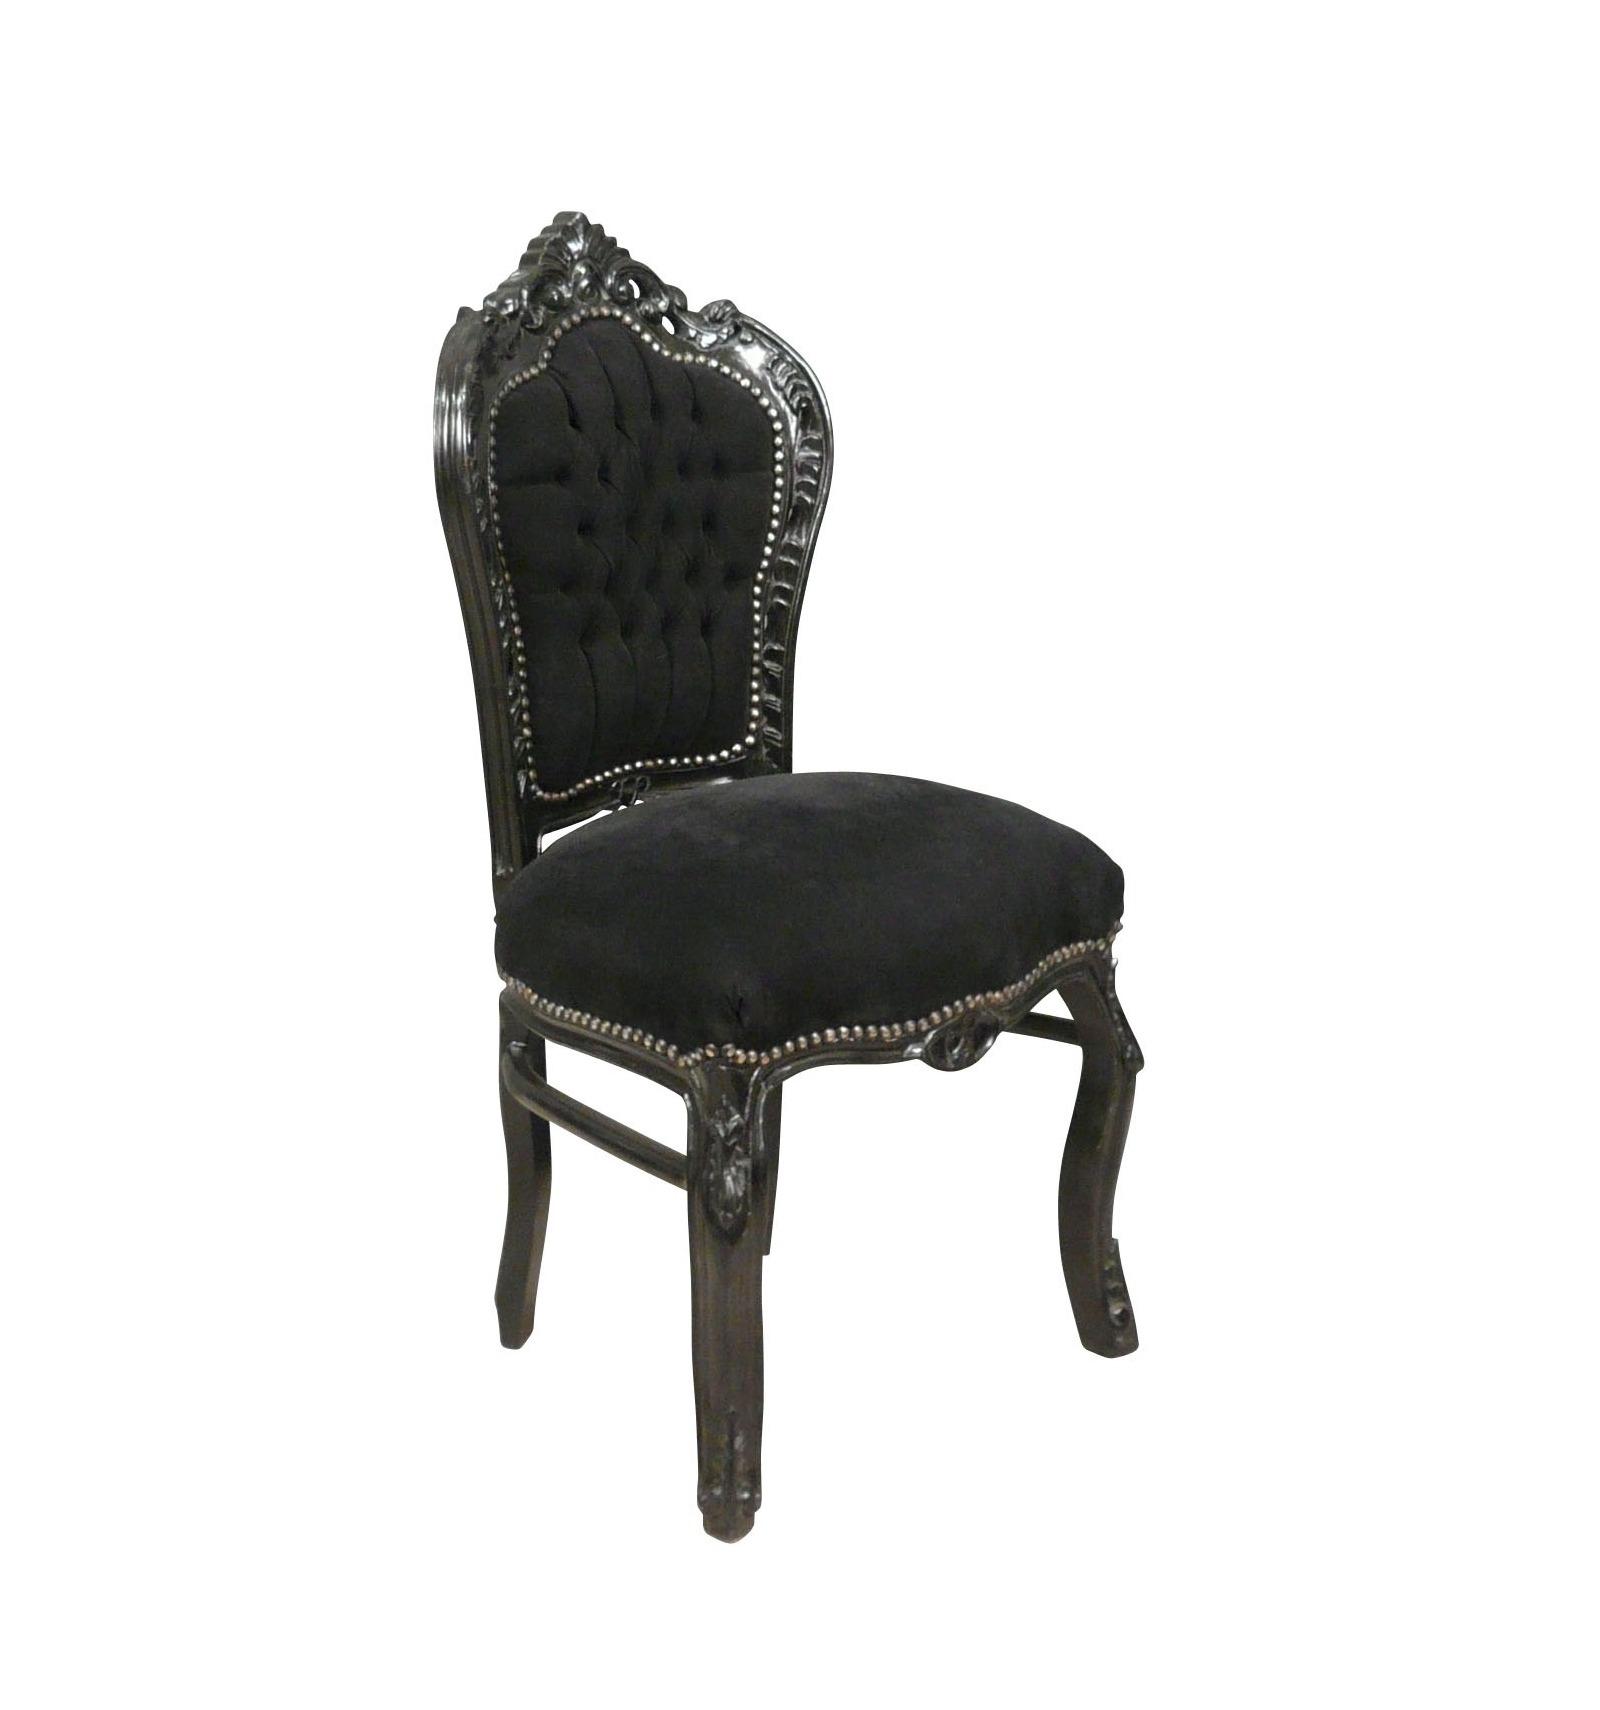 chaise baroque noire pas chre - Chaise Baroque